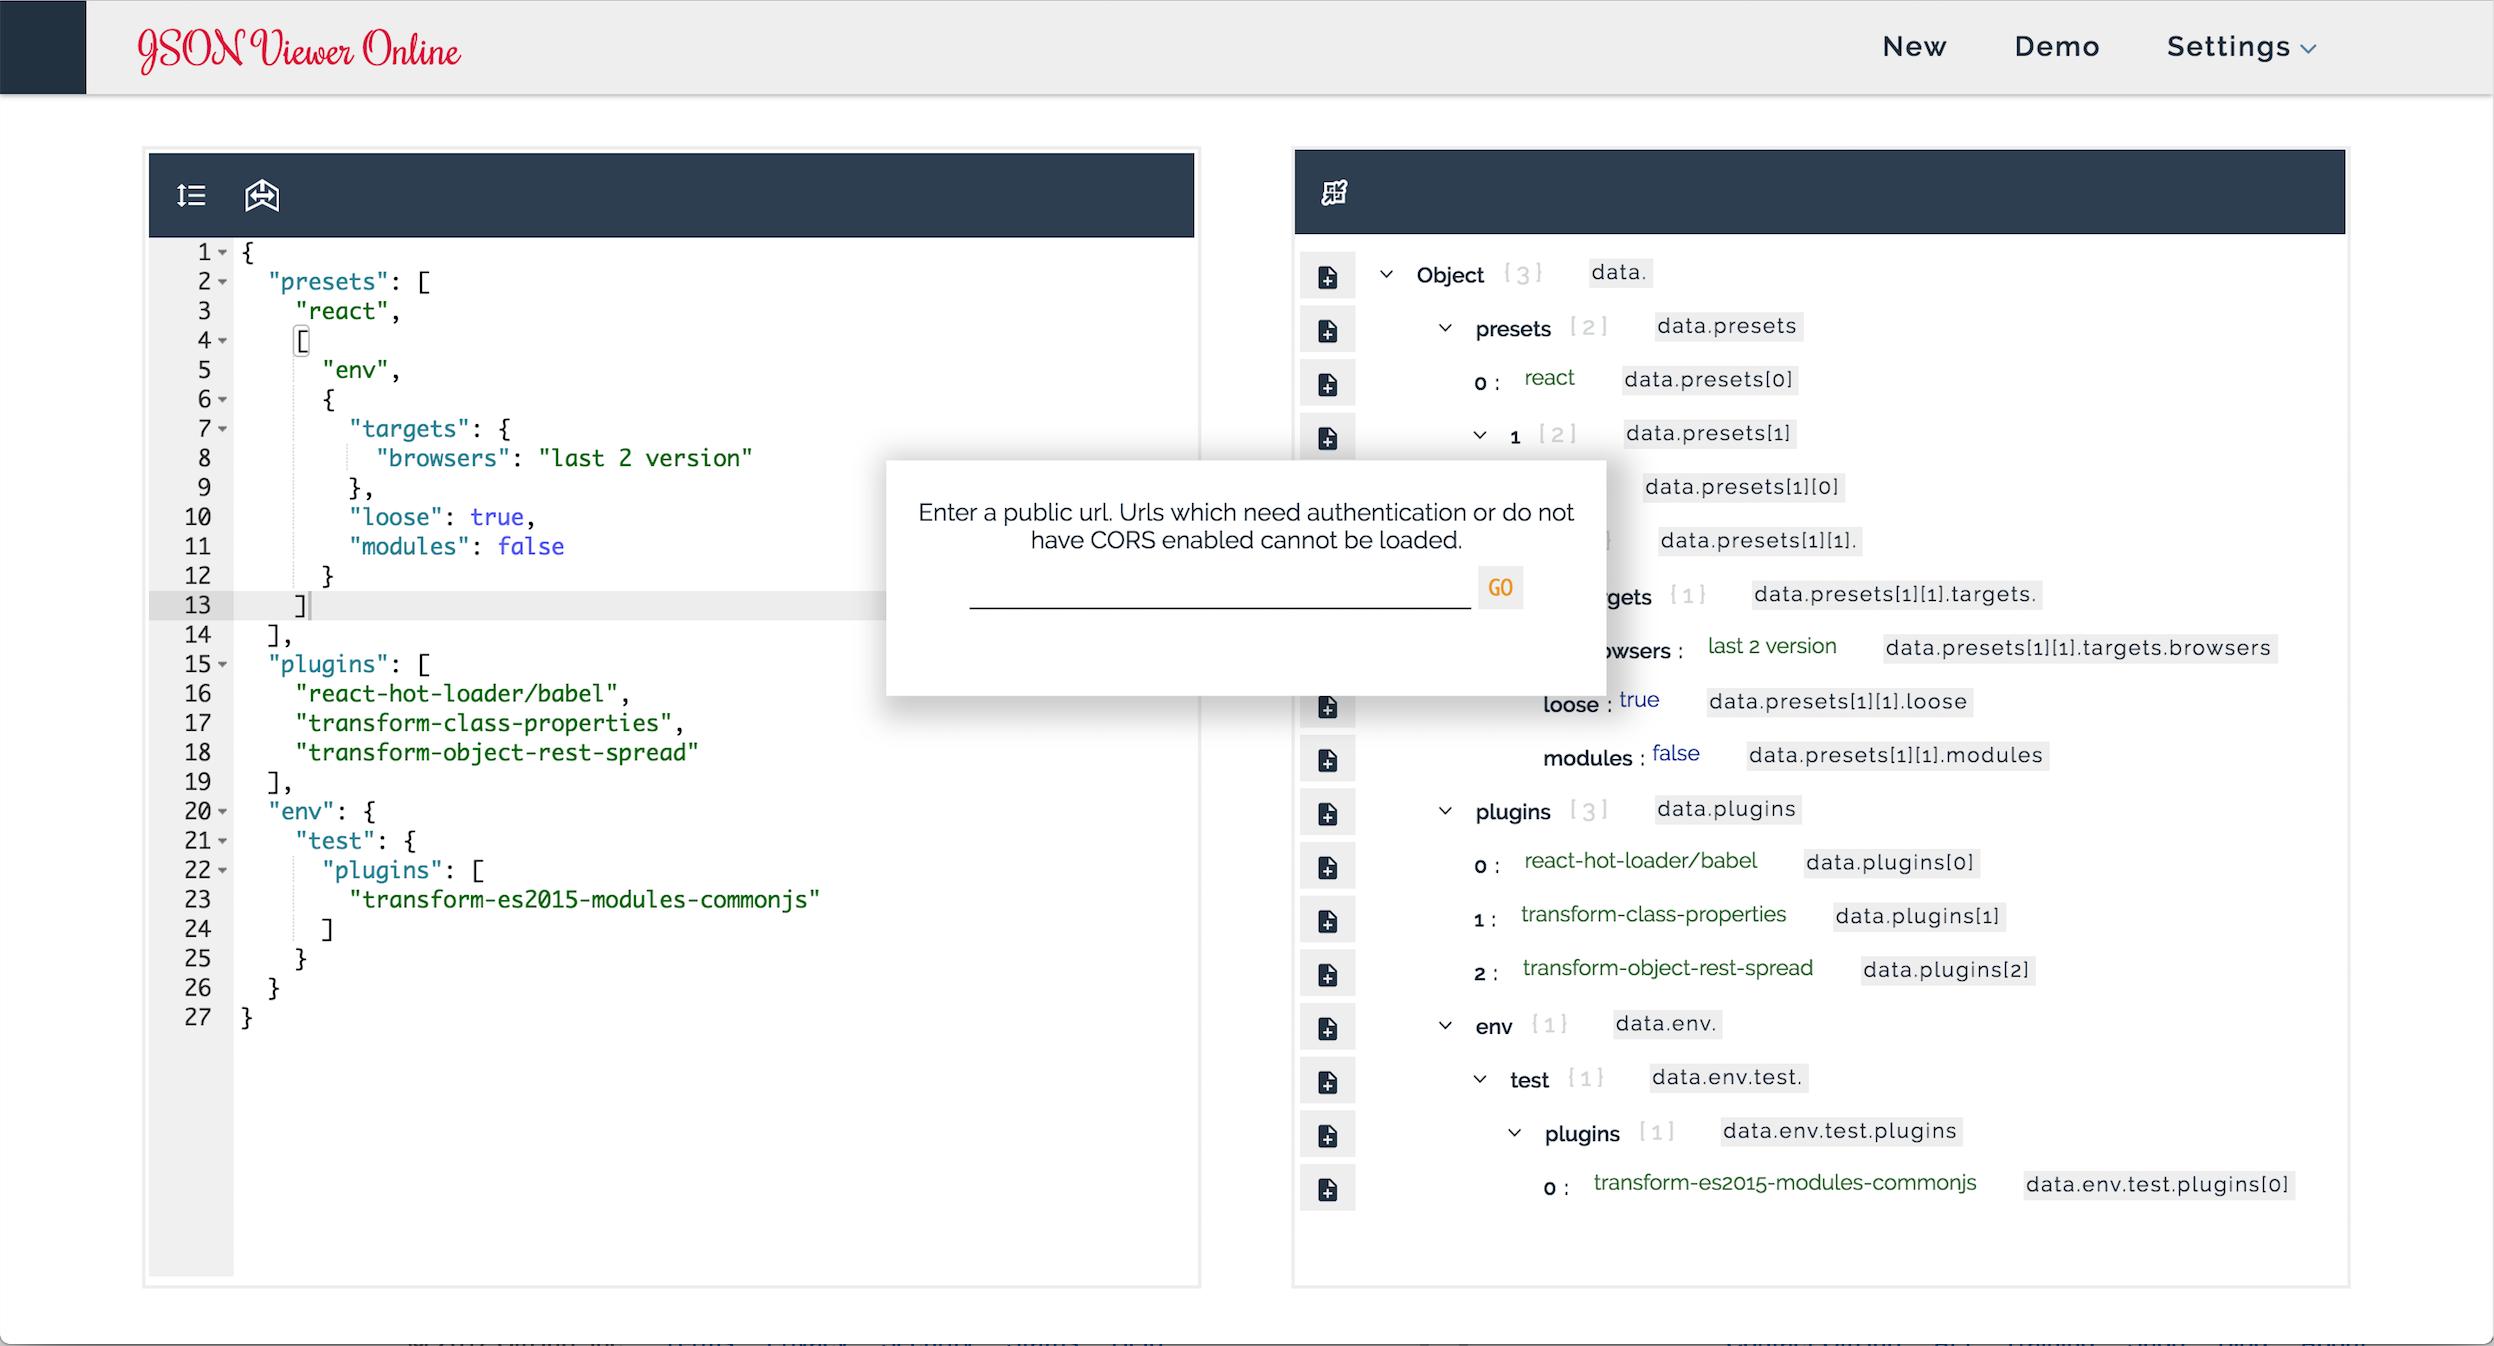 GitHub - Gregjarvez/React-redux-json-viewer: Online JSON